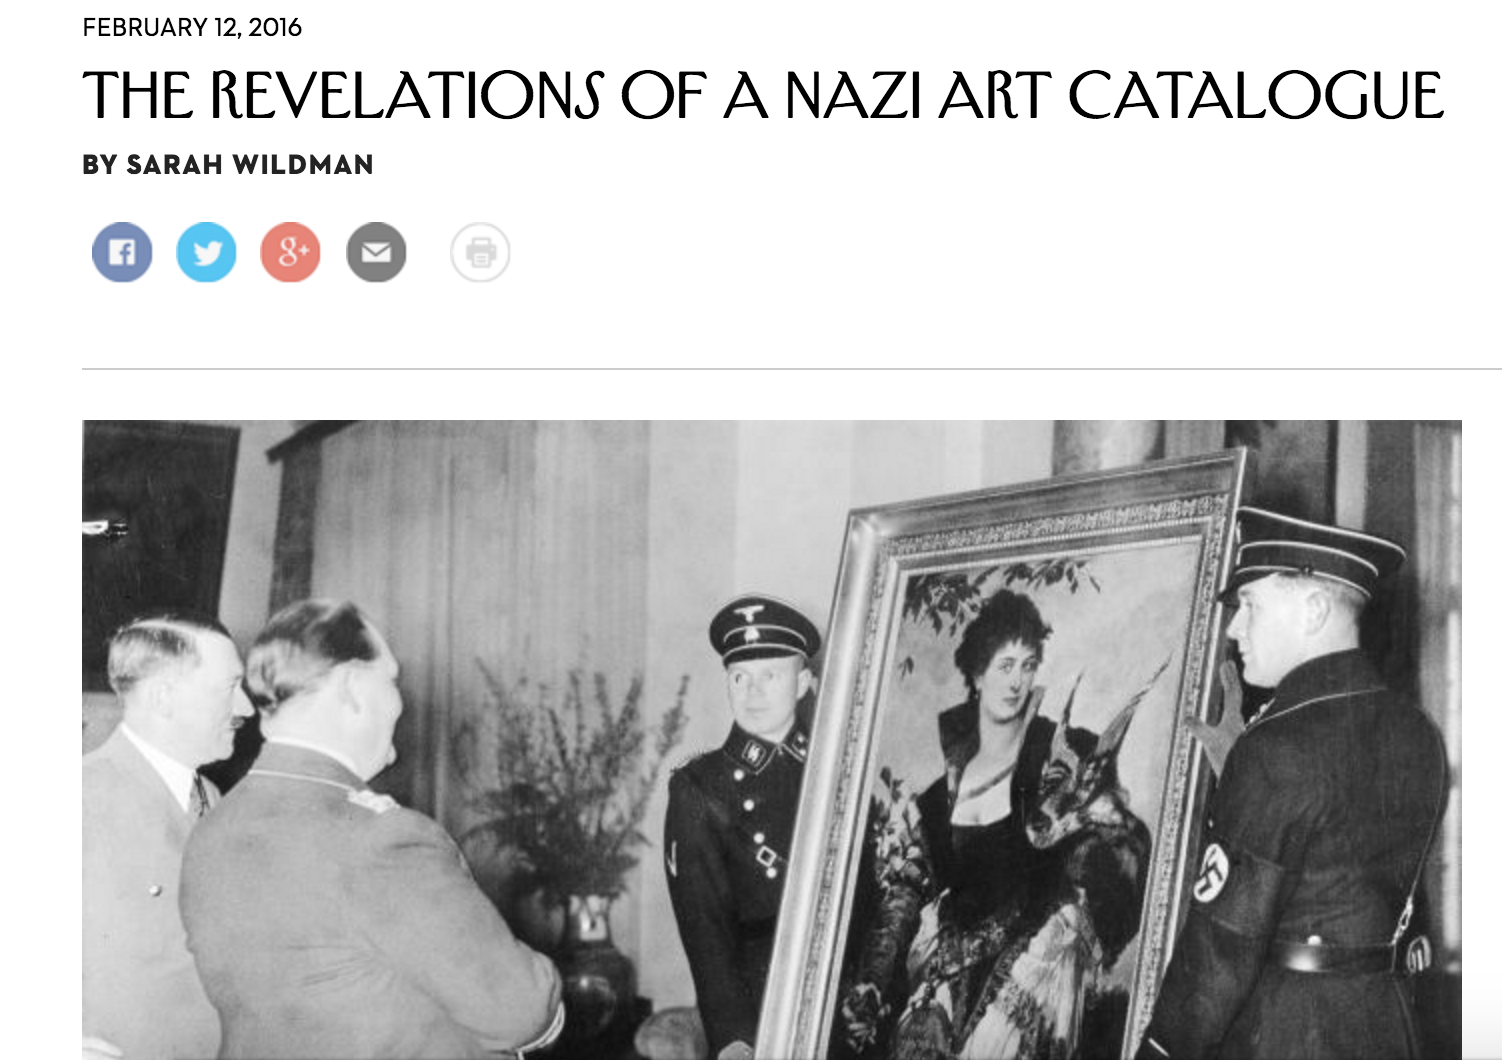 New Yorker: Hermann Göring's Art Catalogue